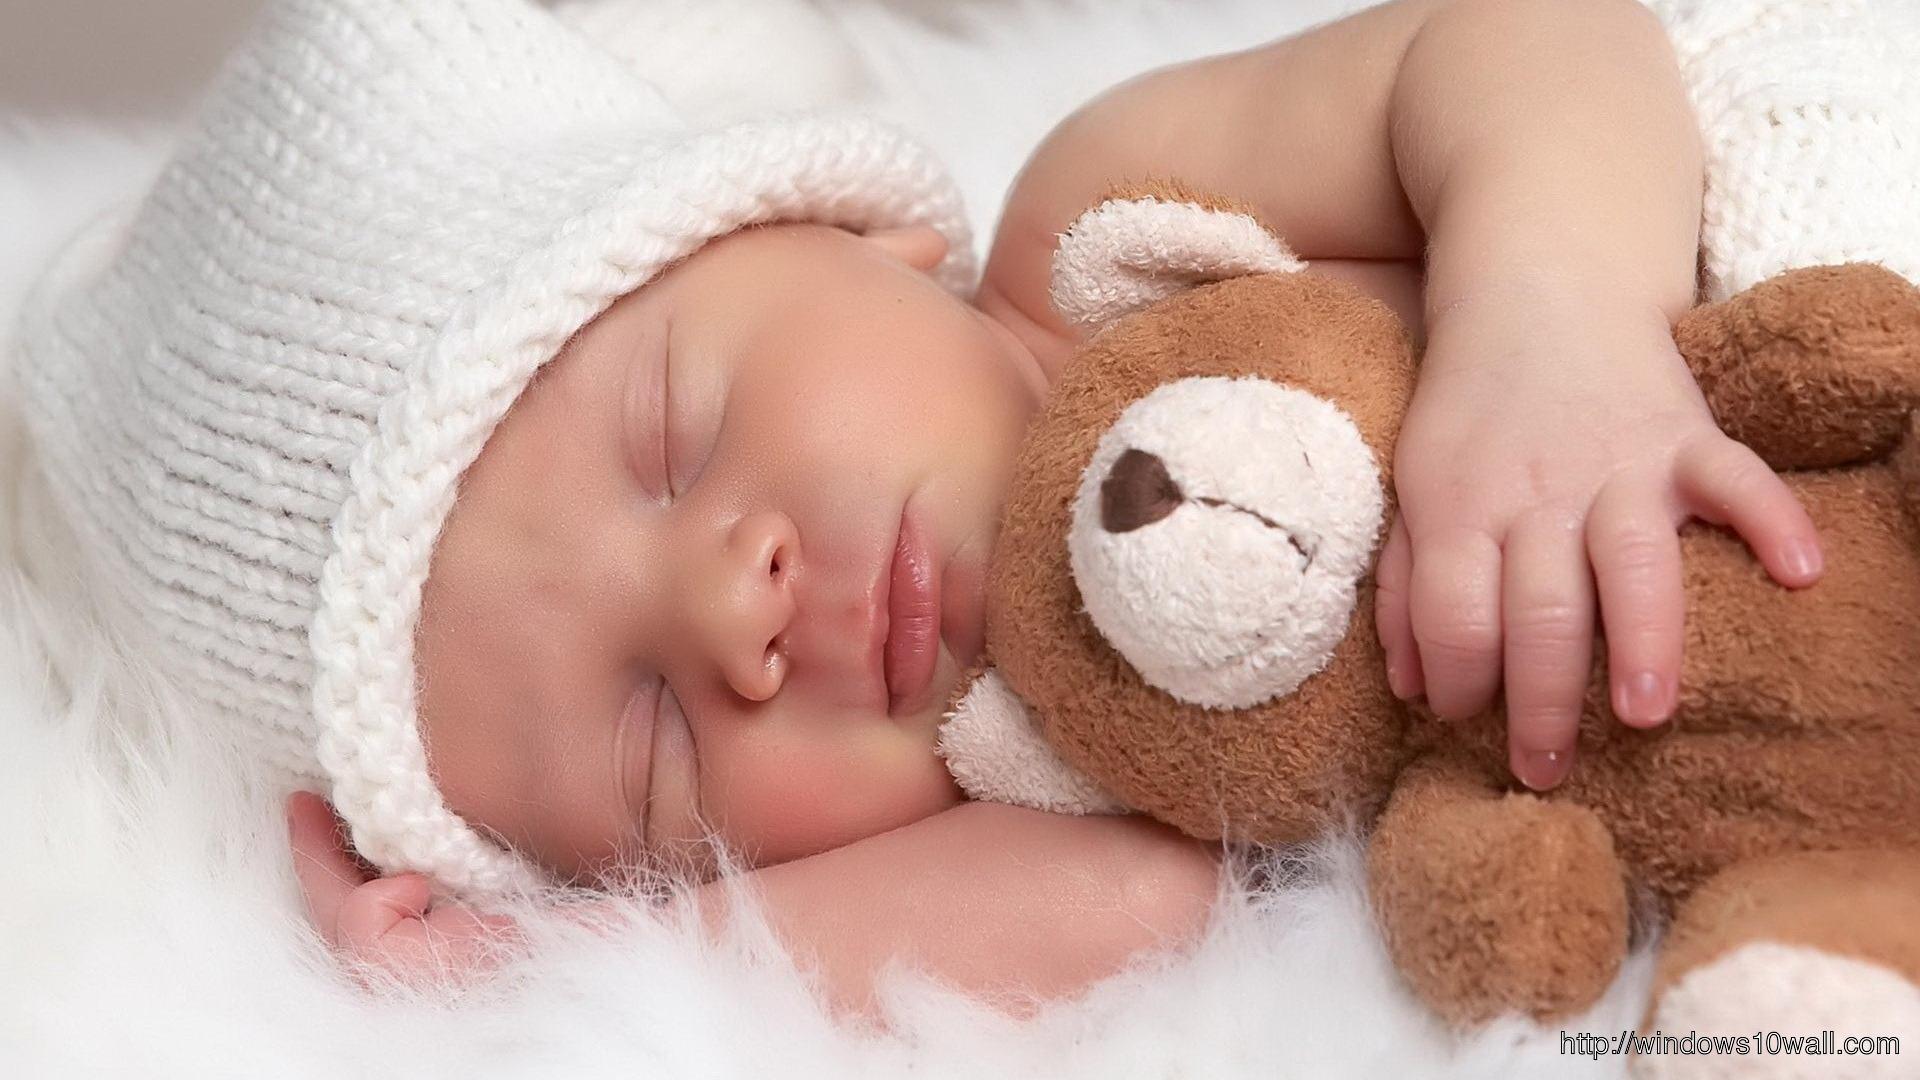 Cute Baby Sleeping HD Wallpaper